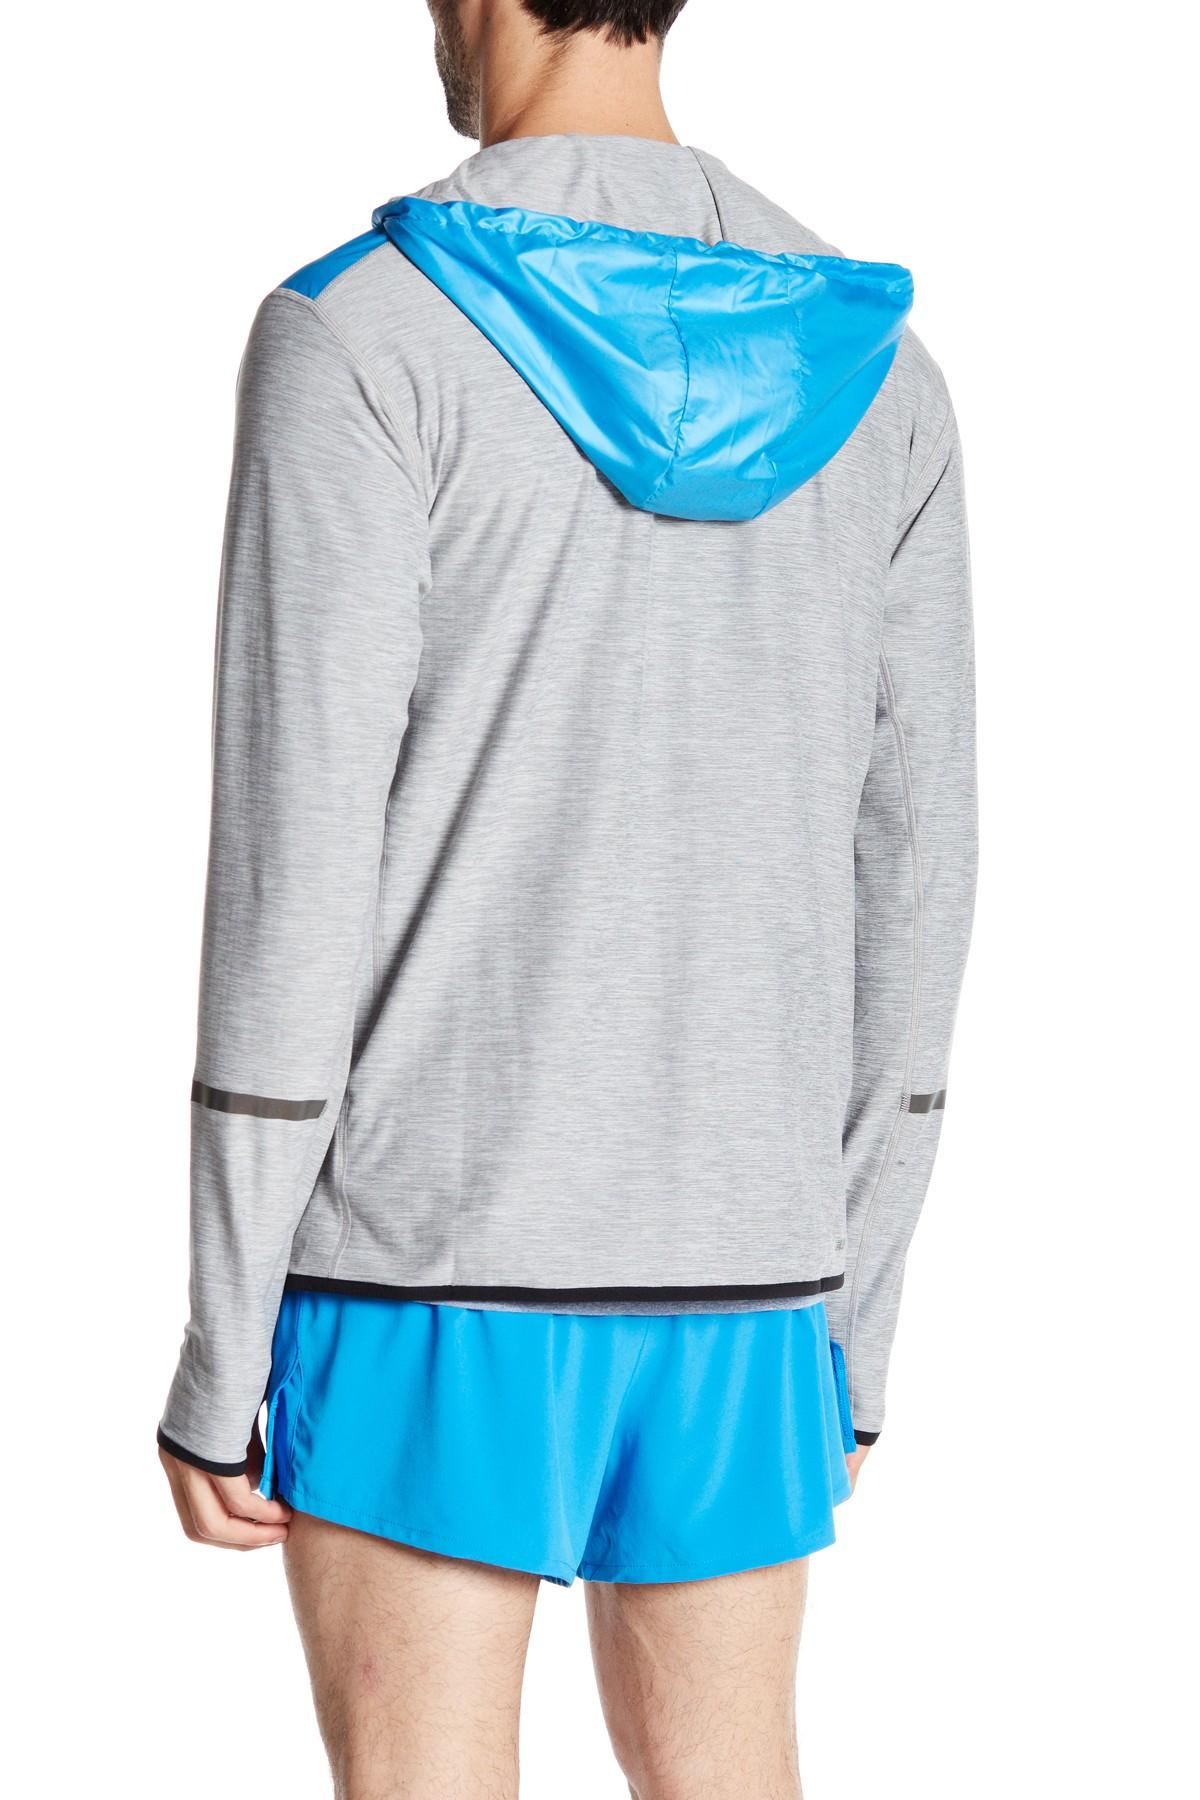 lyst new balance nb transit hoodie in blue for men. Black Bedroom Furniture Sets. Home Design Ideas